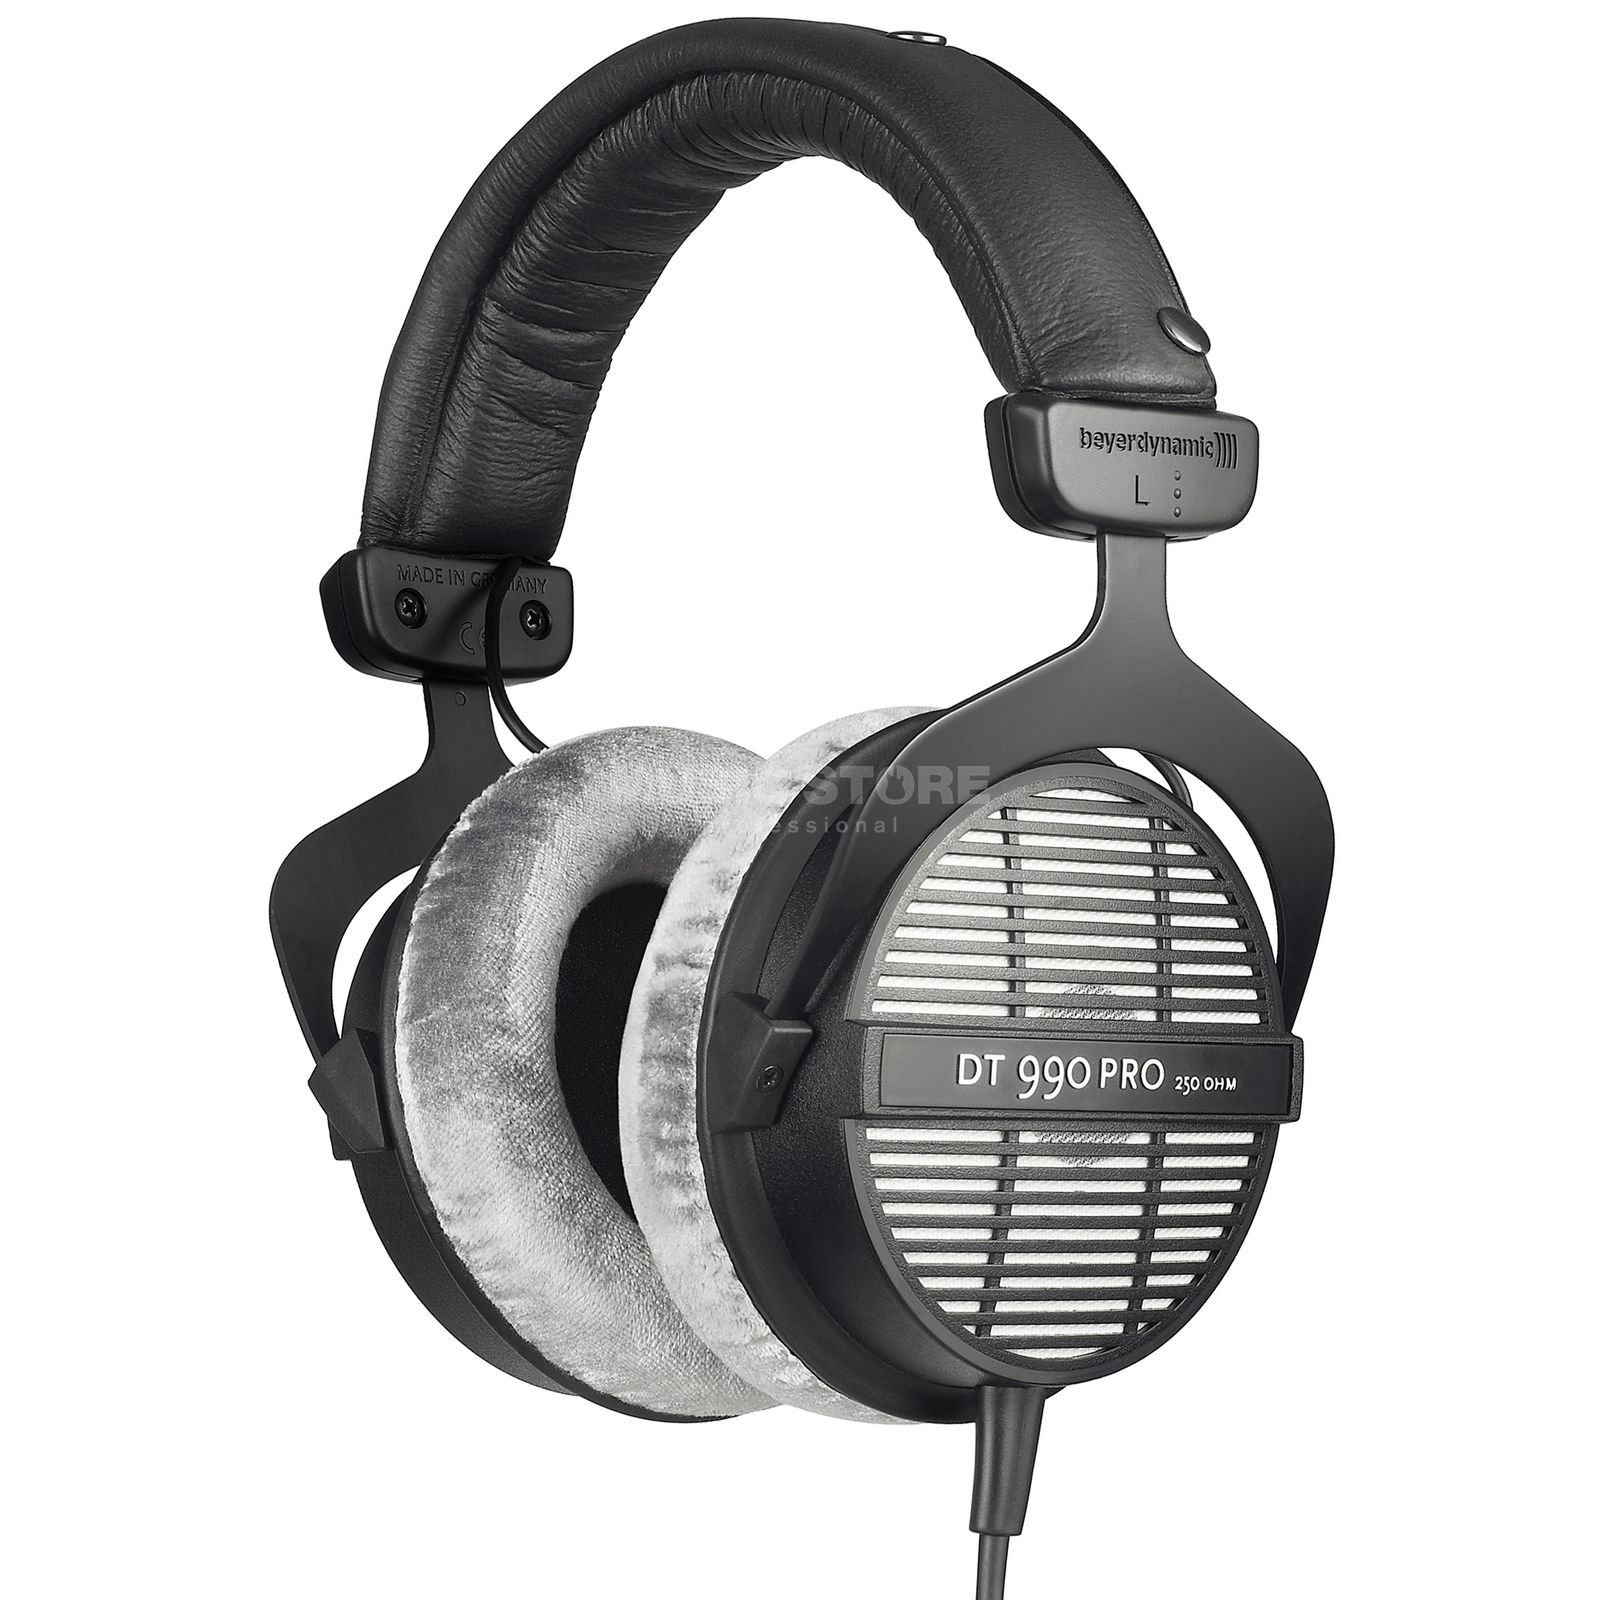 beyerdynamic dt 990 pro 250 ohm open studio headphones dv247